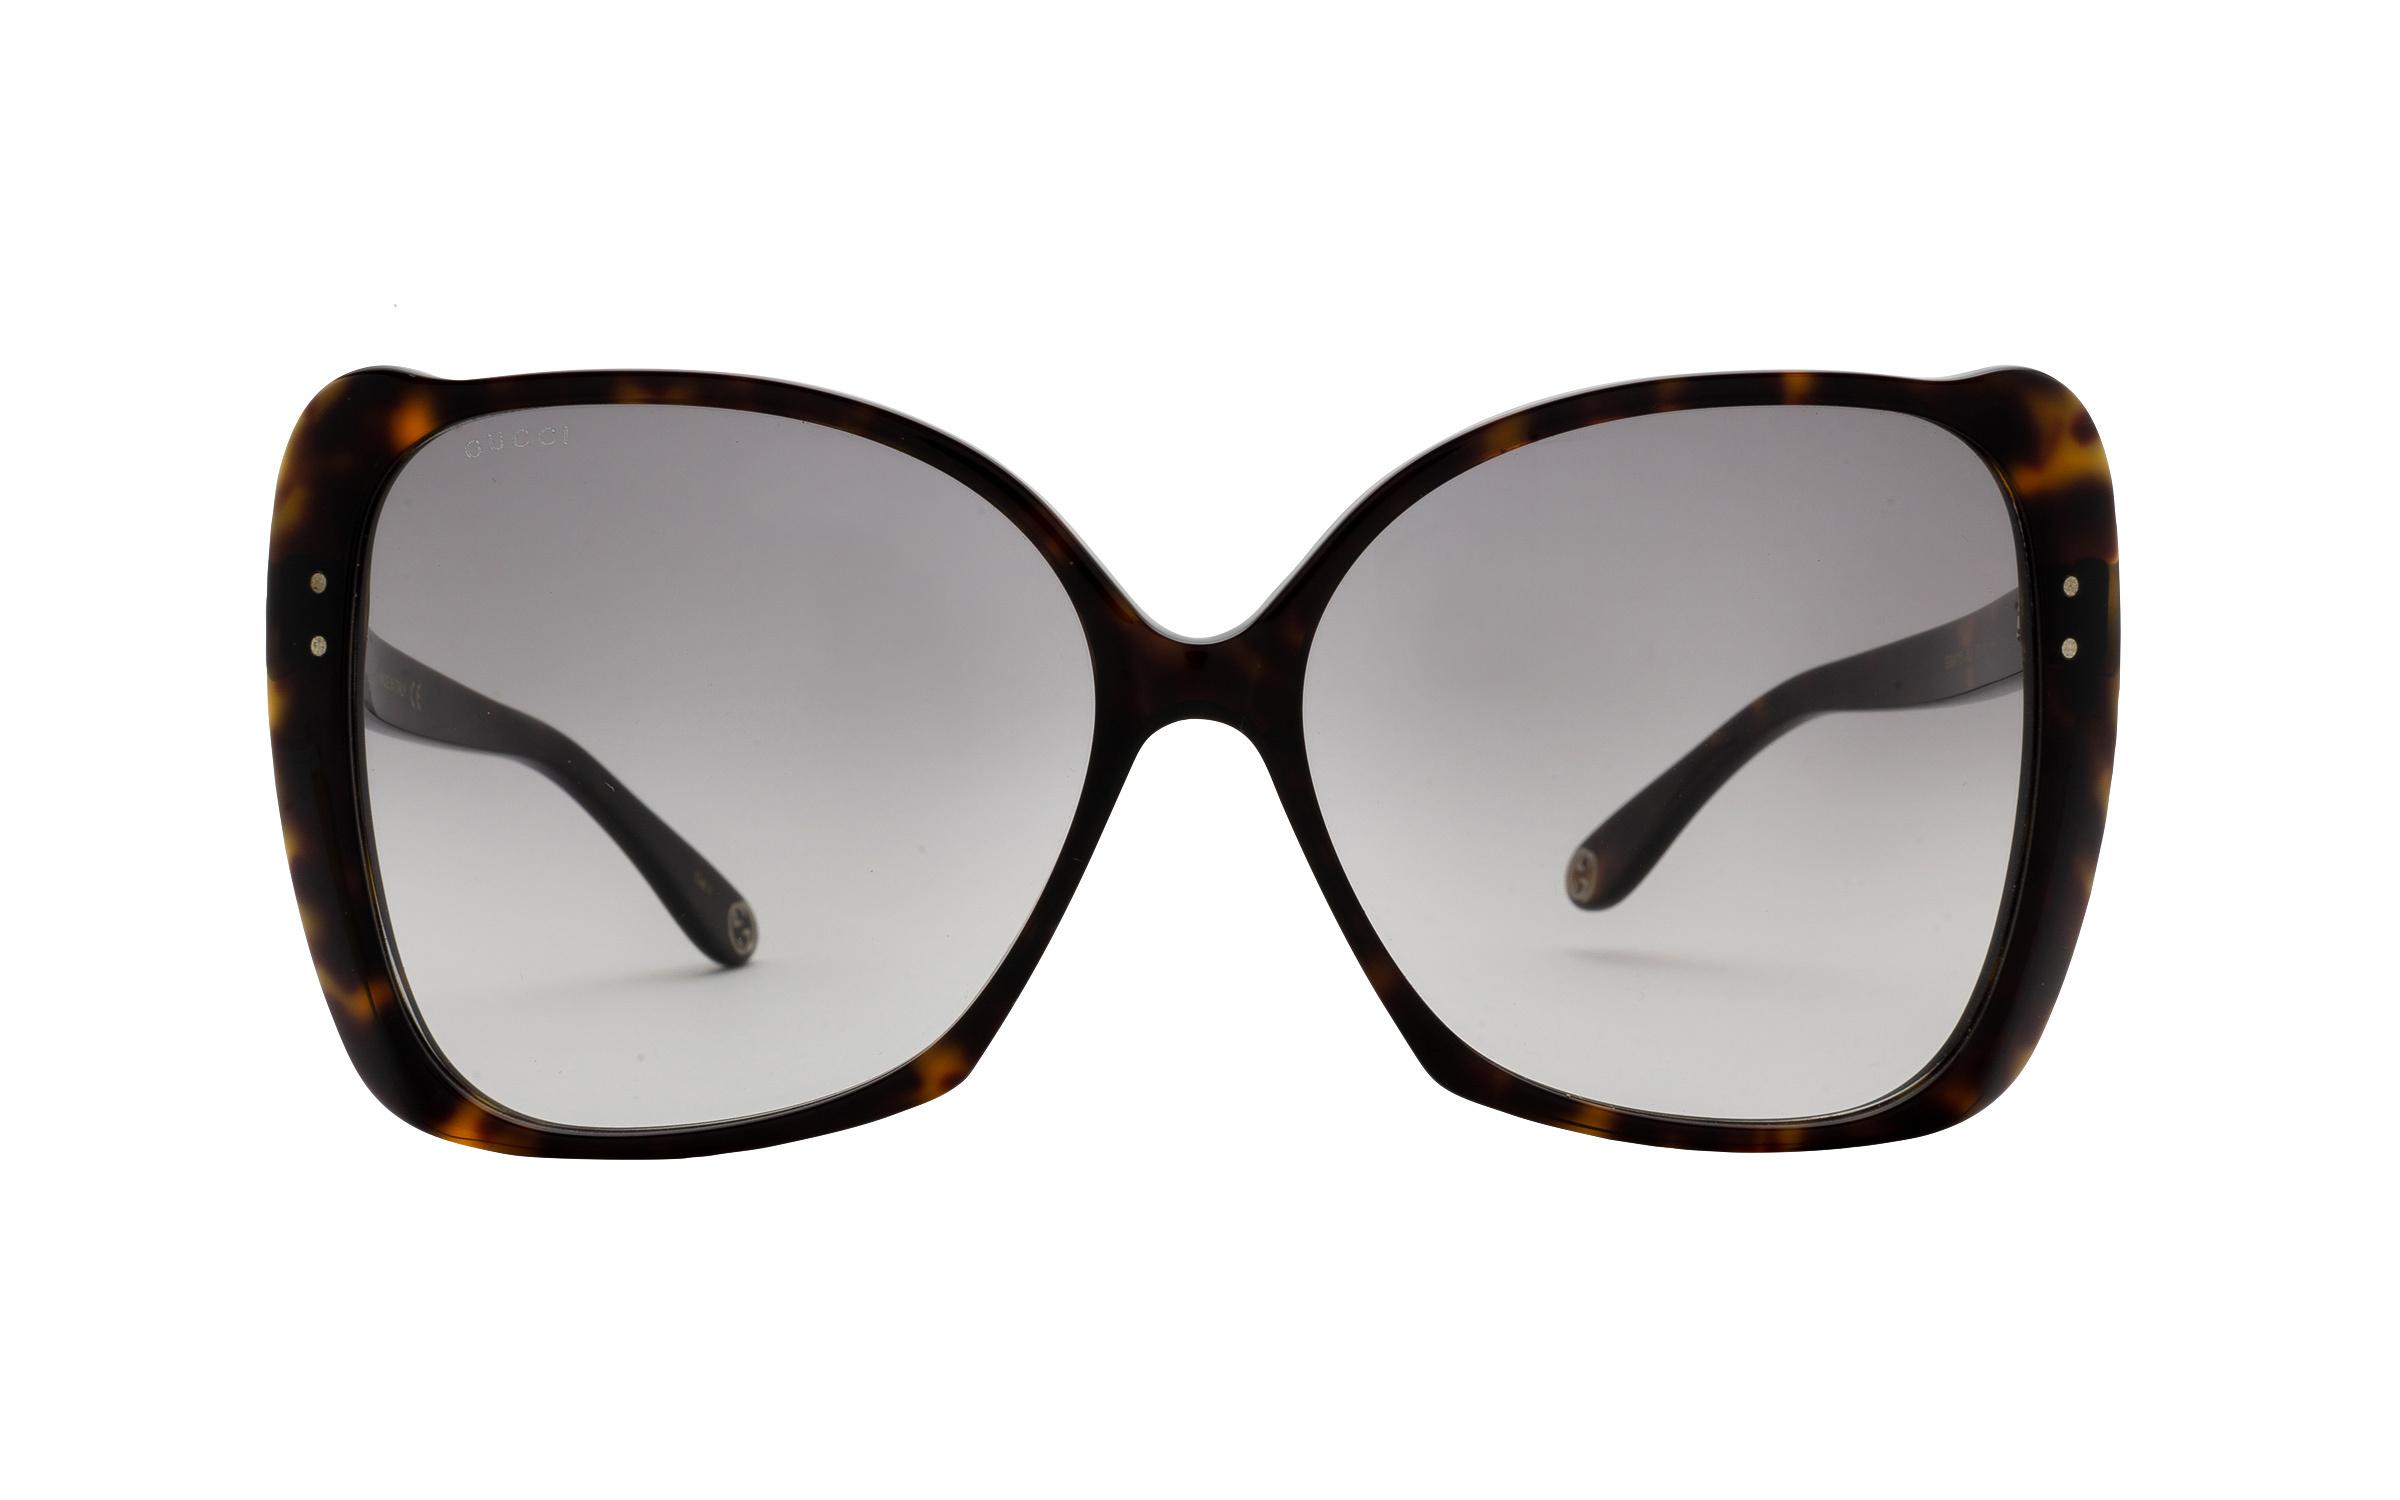 http://www.coastal.com/ - Gucci GG0471S 002 62 Sunglasses in Dark Havana Tortoise – Online Coastal